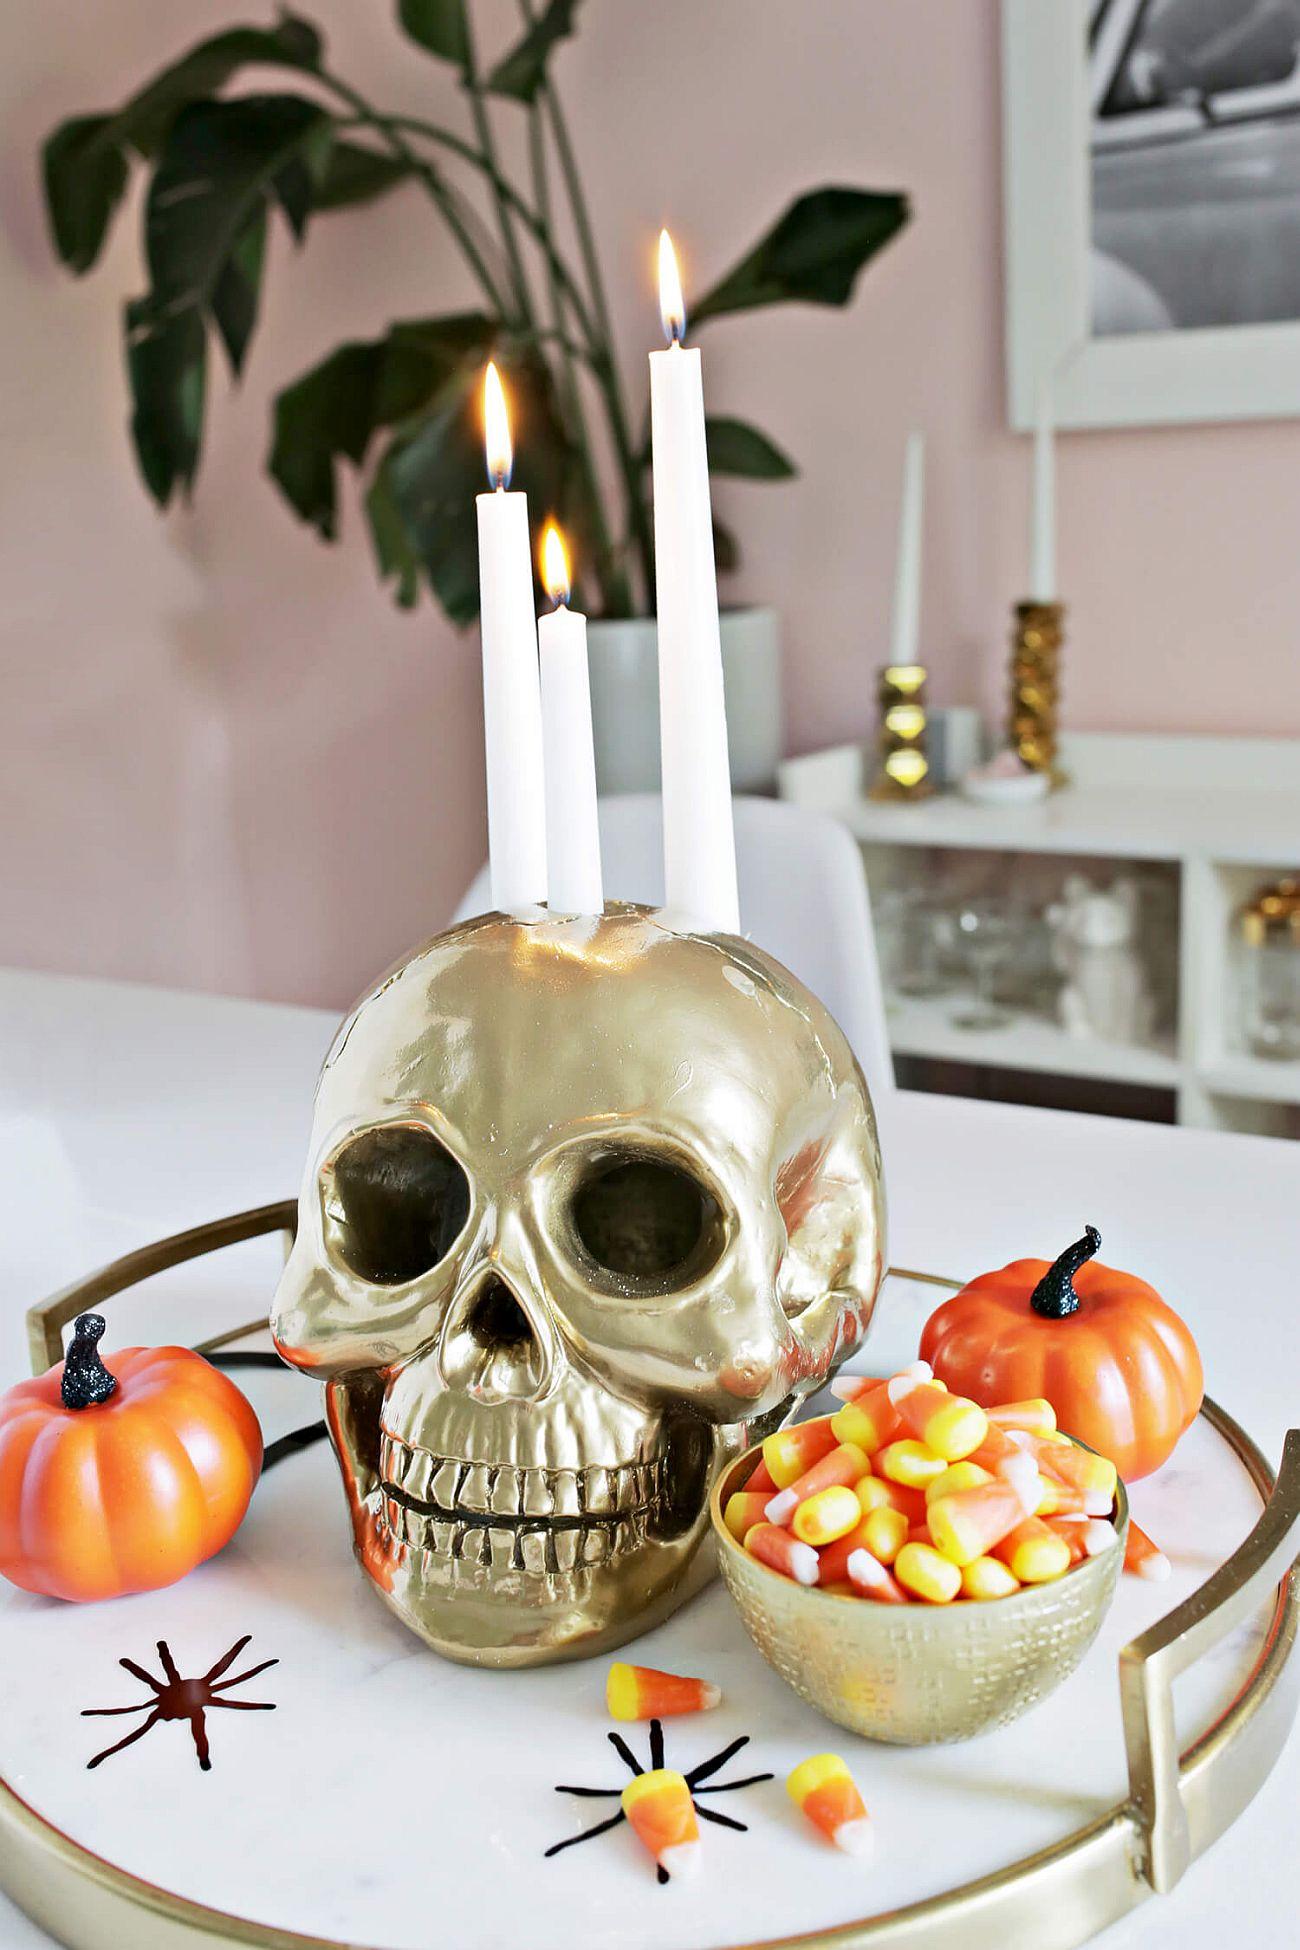 Creepy Halloween Decorations